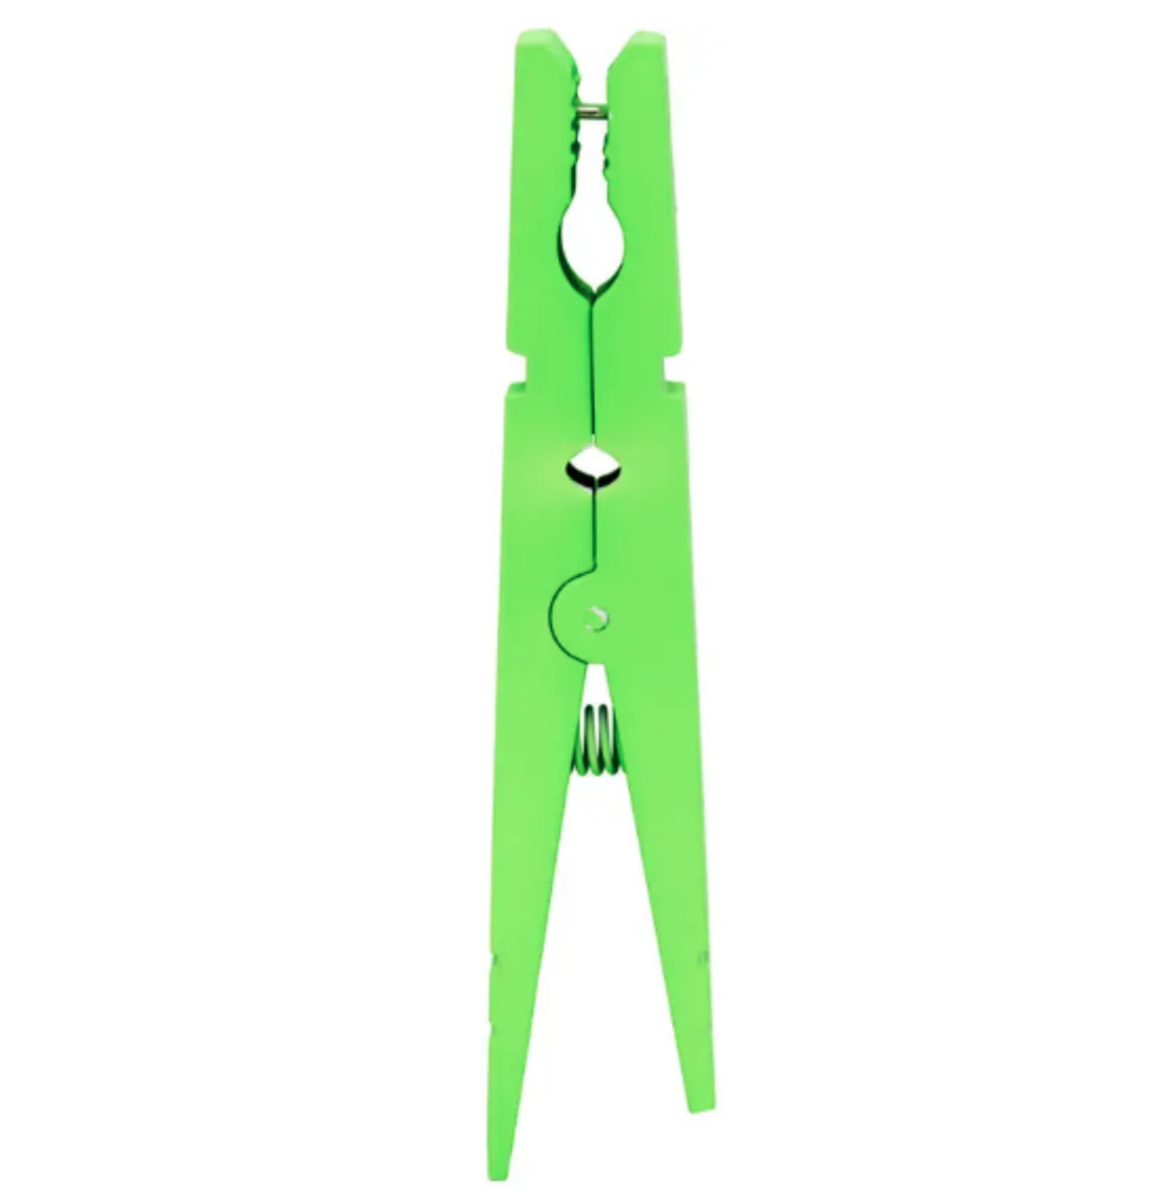 Ambush Green Nobo Clip Earring, $215, available here.